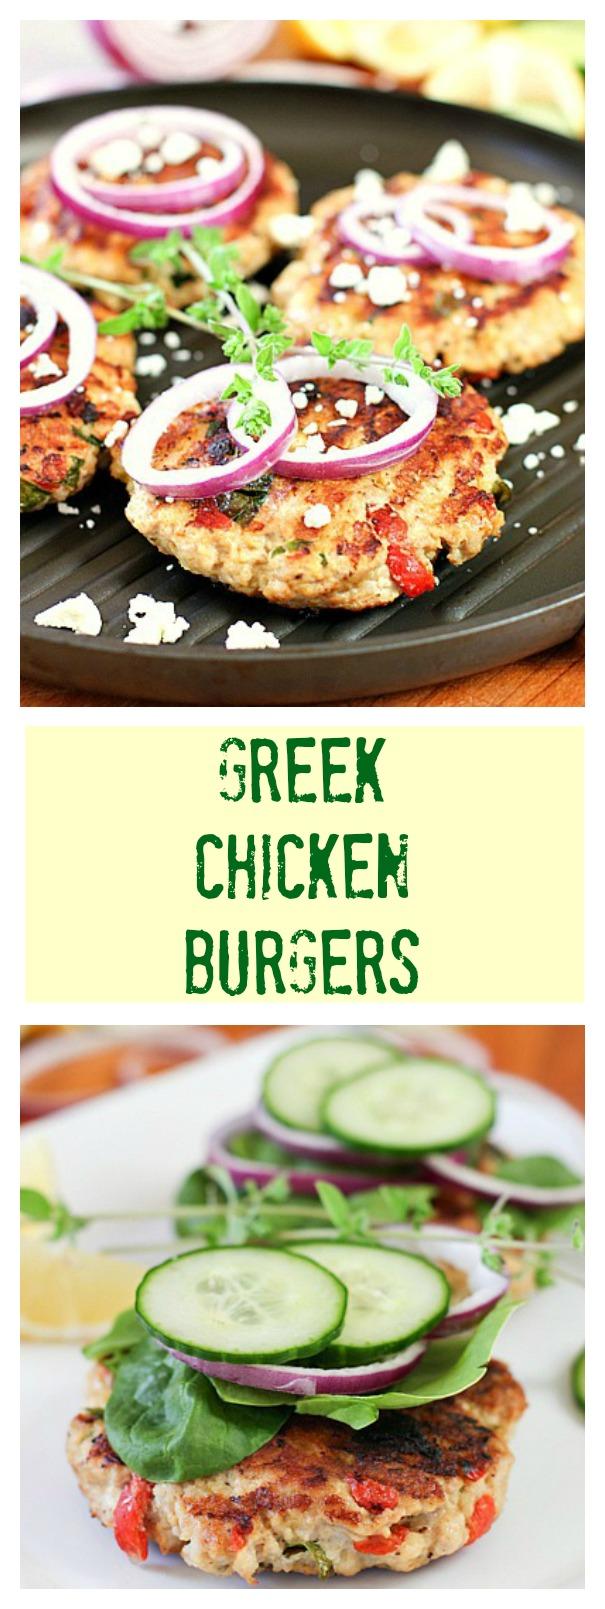 http://laughingspatula.com/greek-chicken-burgers/